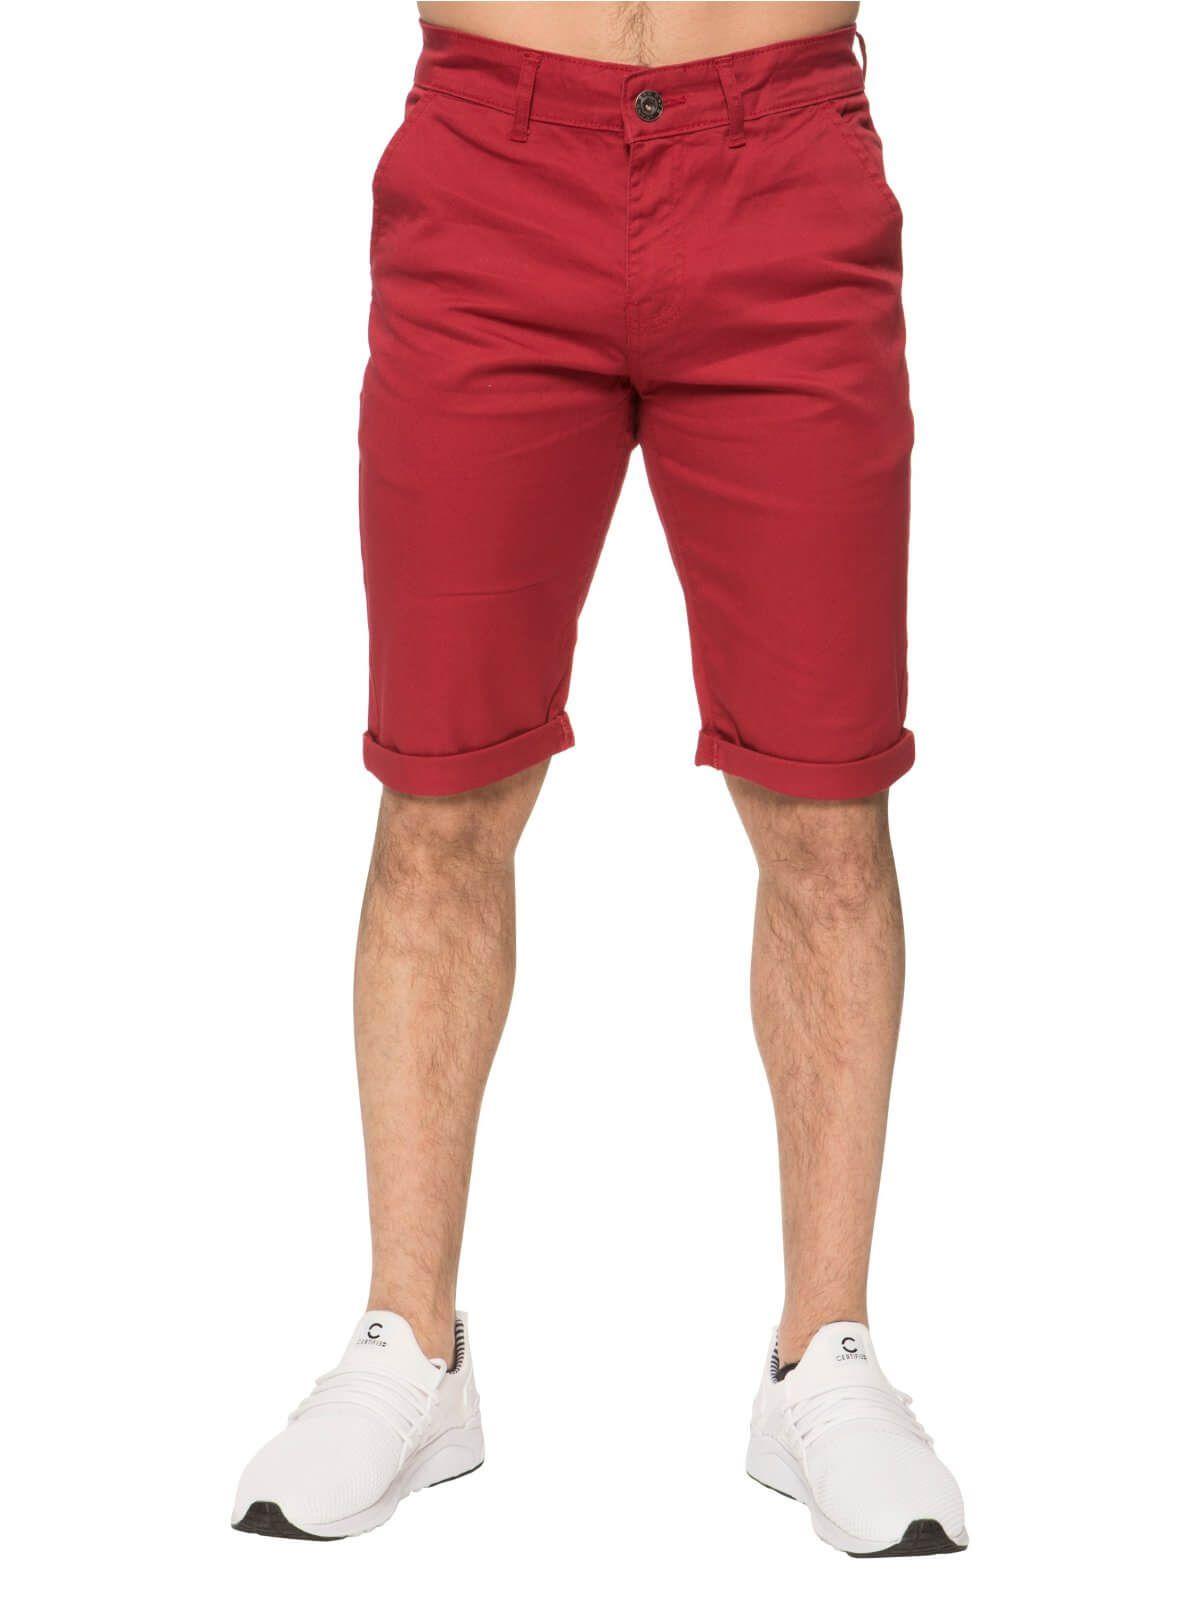 Mens Slim Fit Stretch Chino Shorts   Enzo Designer Menswear